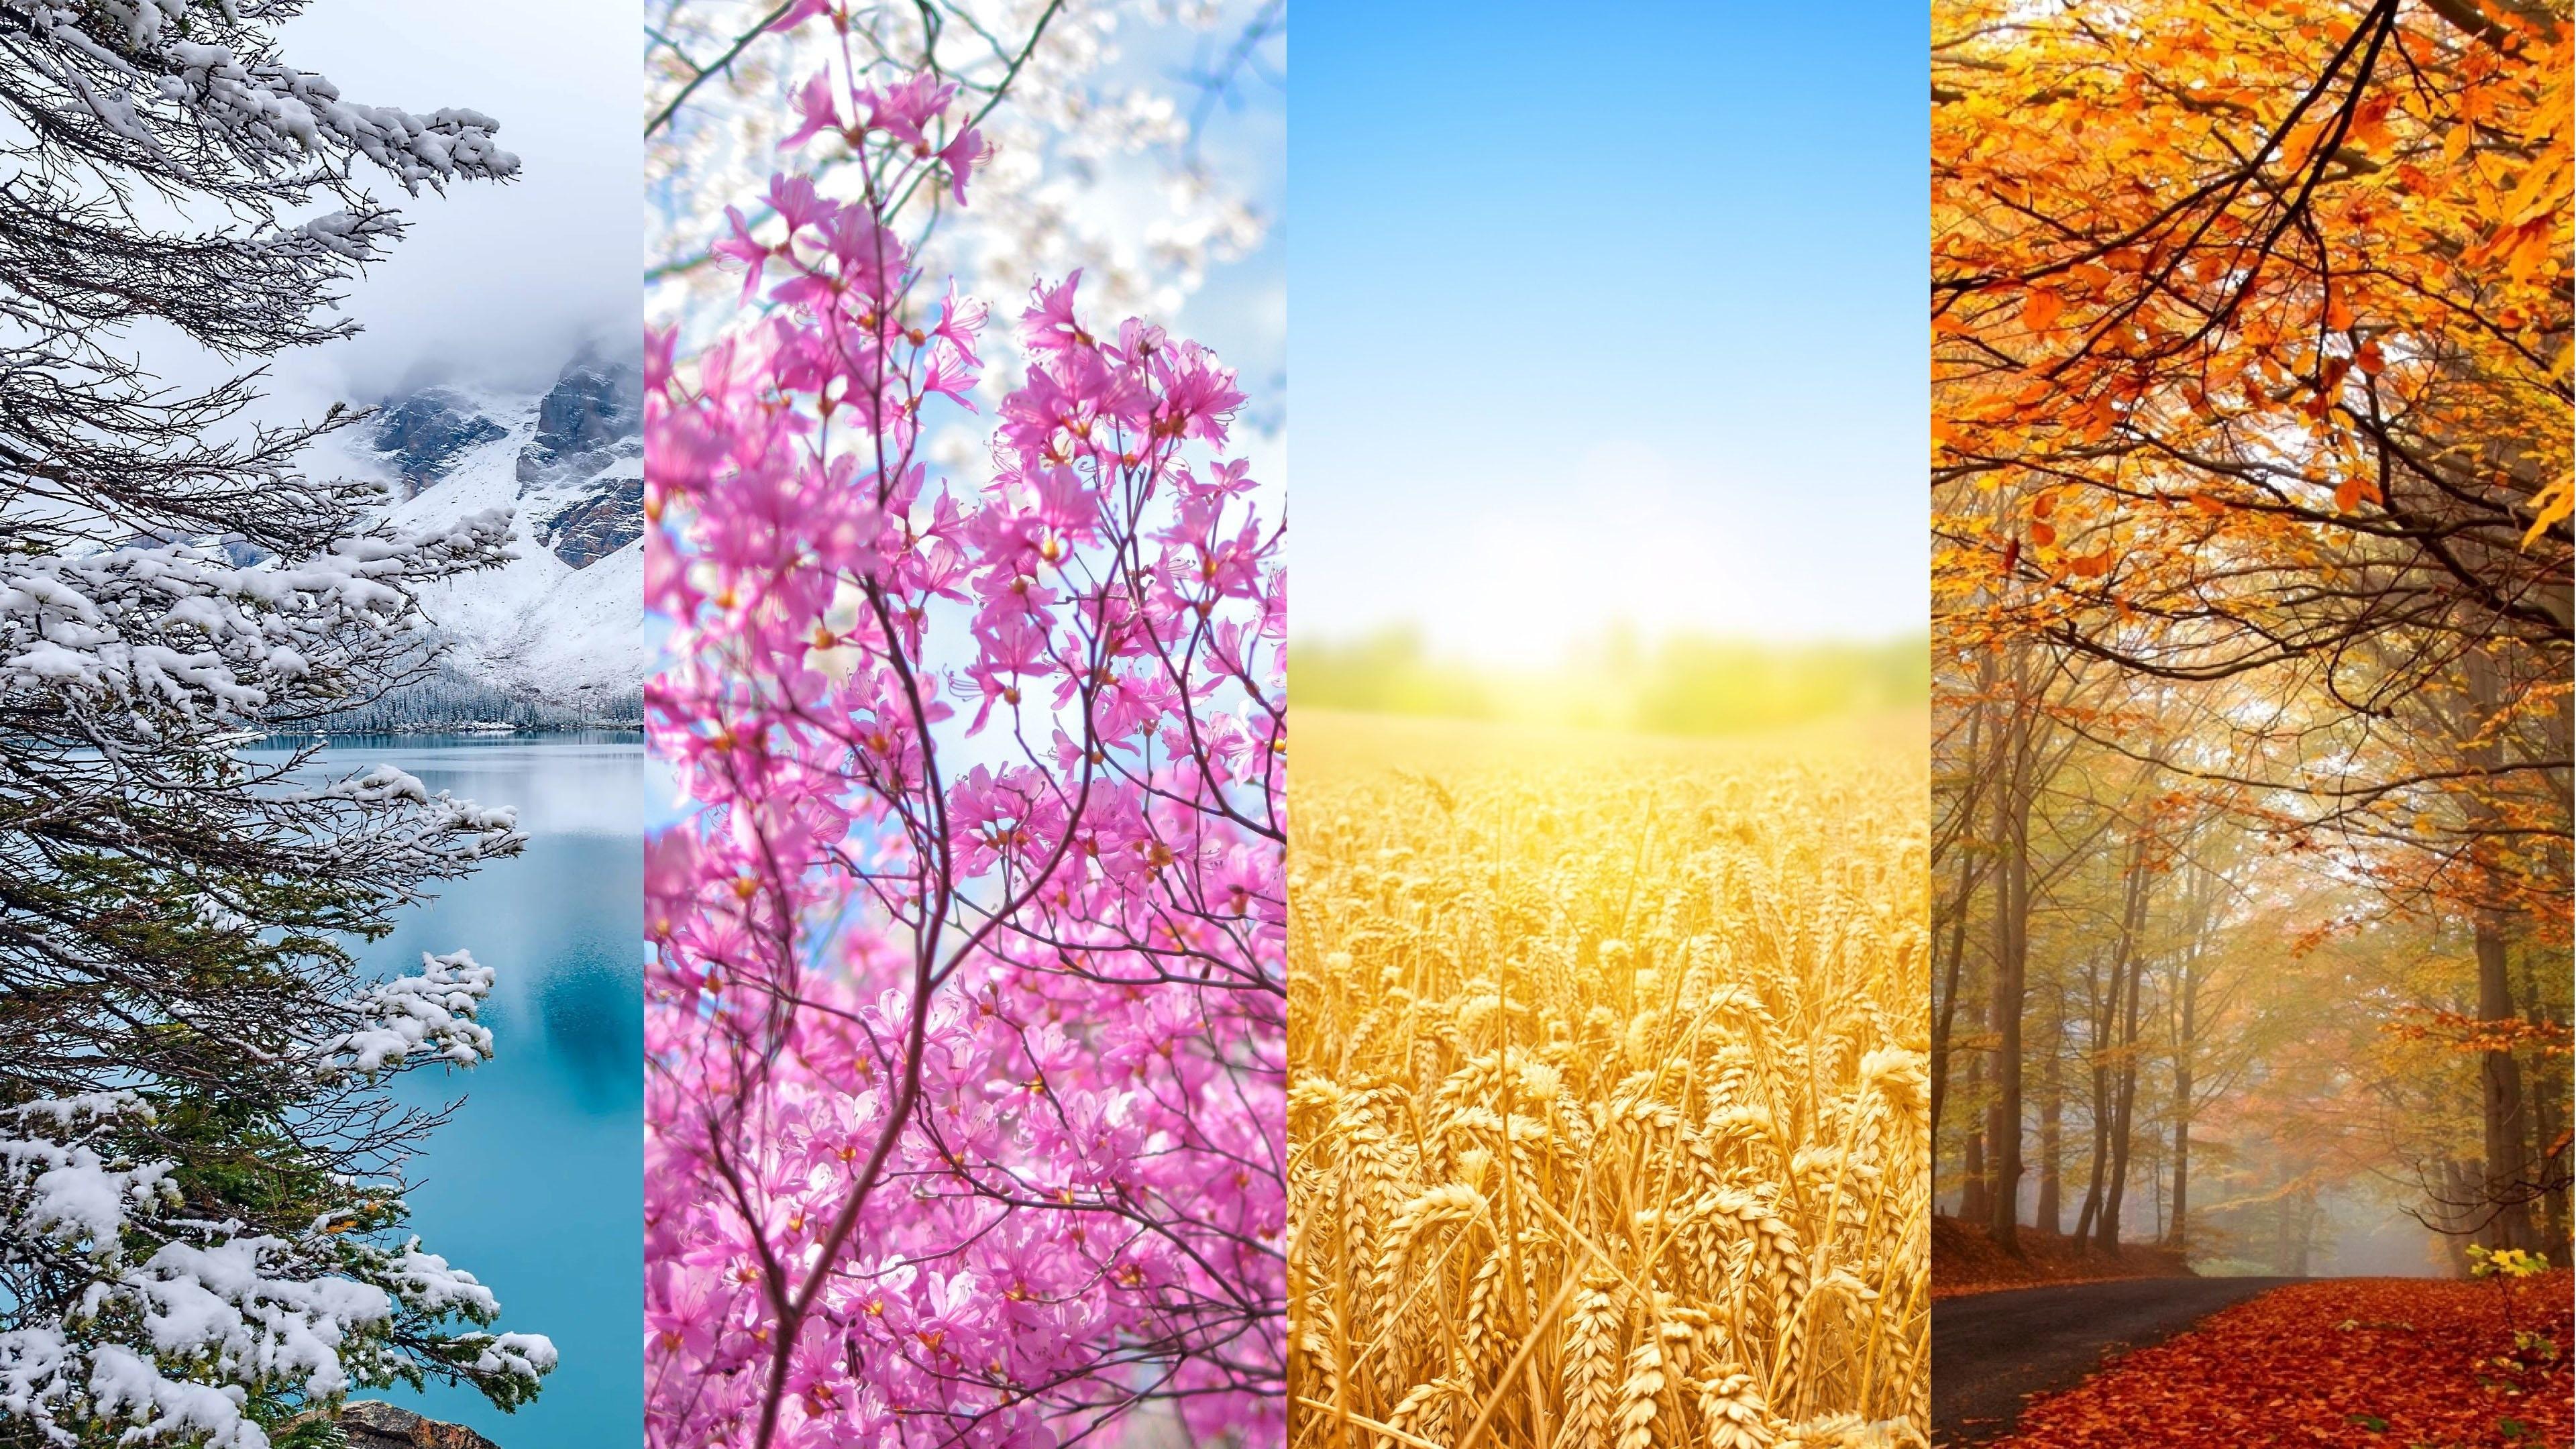 Four Seasons Wallpapers